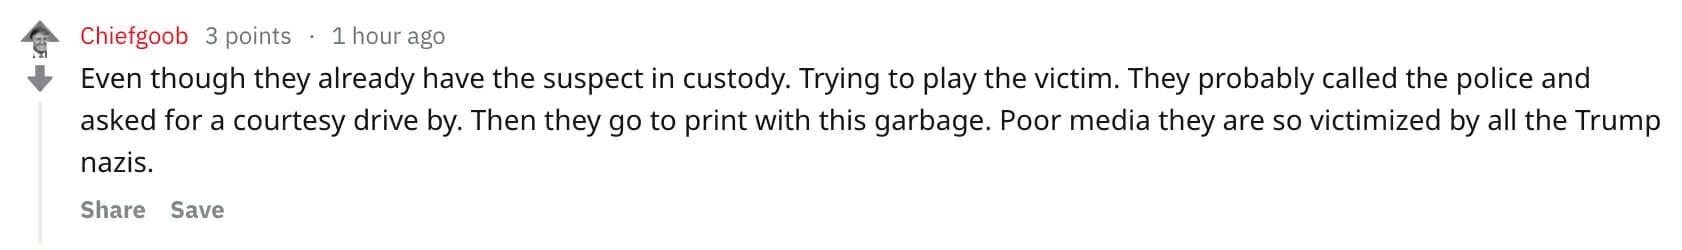 Annapolis shooting Reddit comments